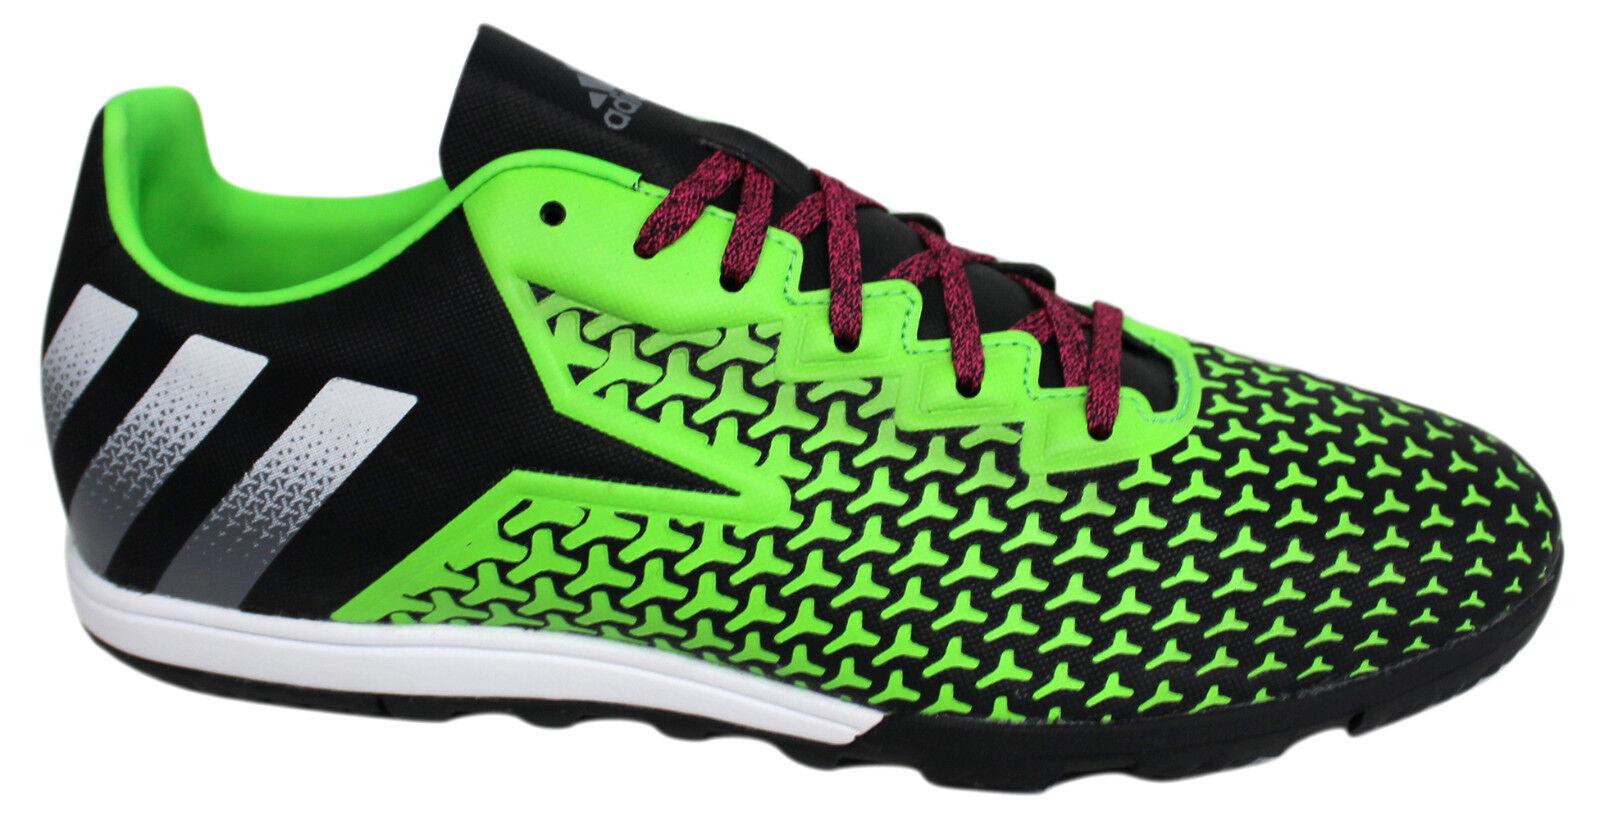 Adidas Ace 16.2 CG verde Nero con Lacci Uomo Calcio Scarpe Sportive AF5295 B37A